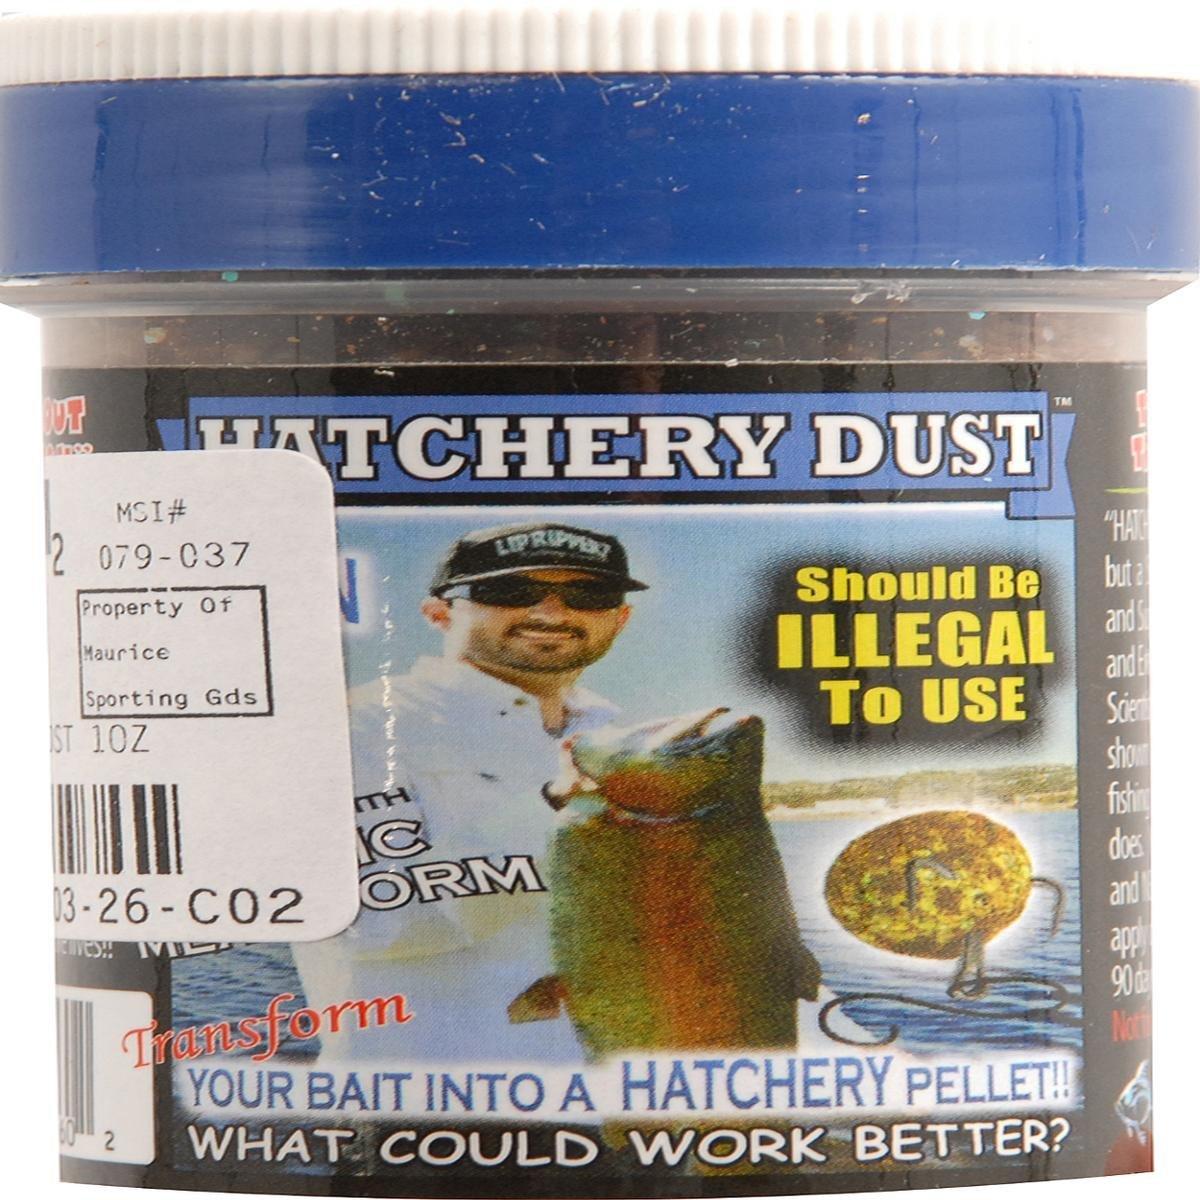 Lip Ripperz Garlic Mealworm Hatchery Dust Prepared Fishing Bait, Brown by Lip Ripperz   B00C8TKXOY